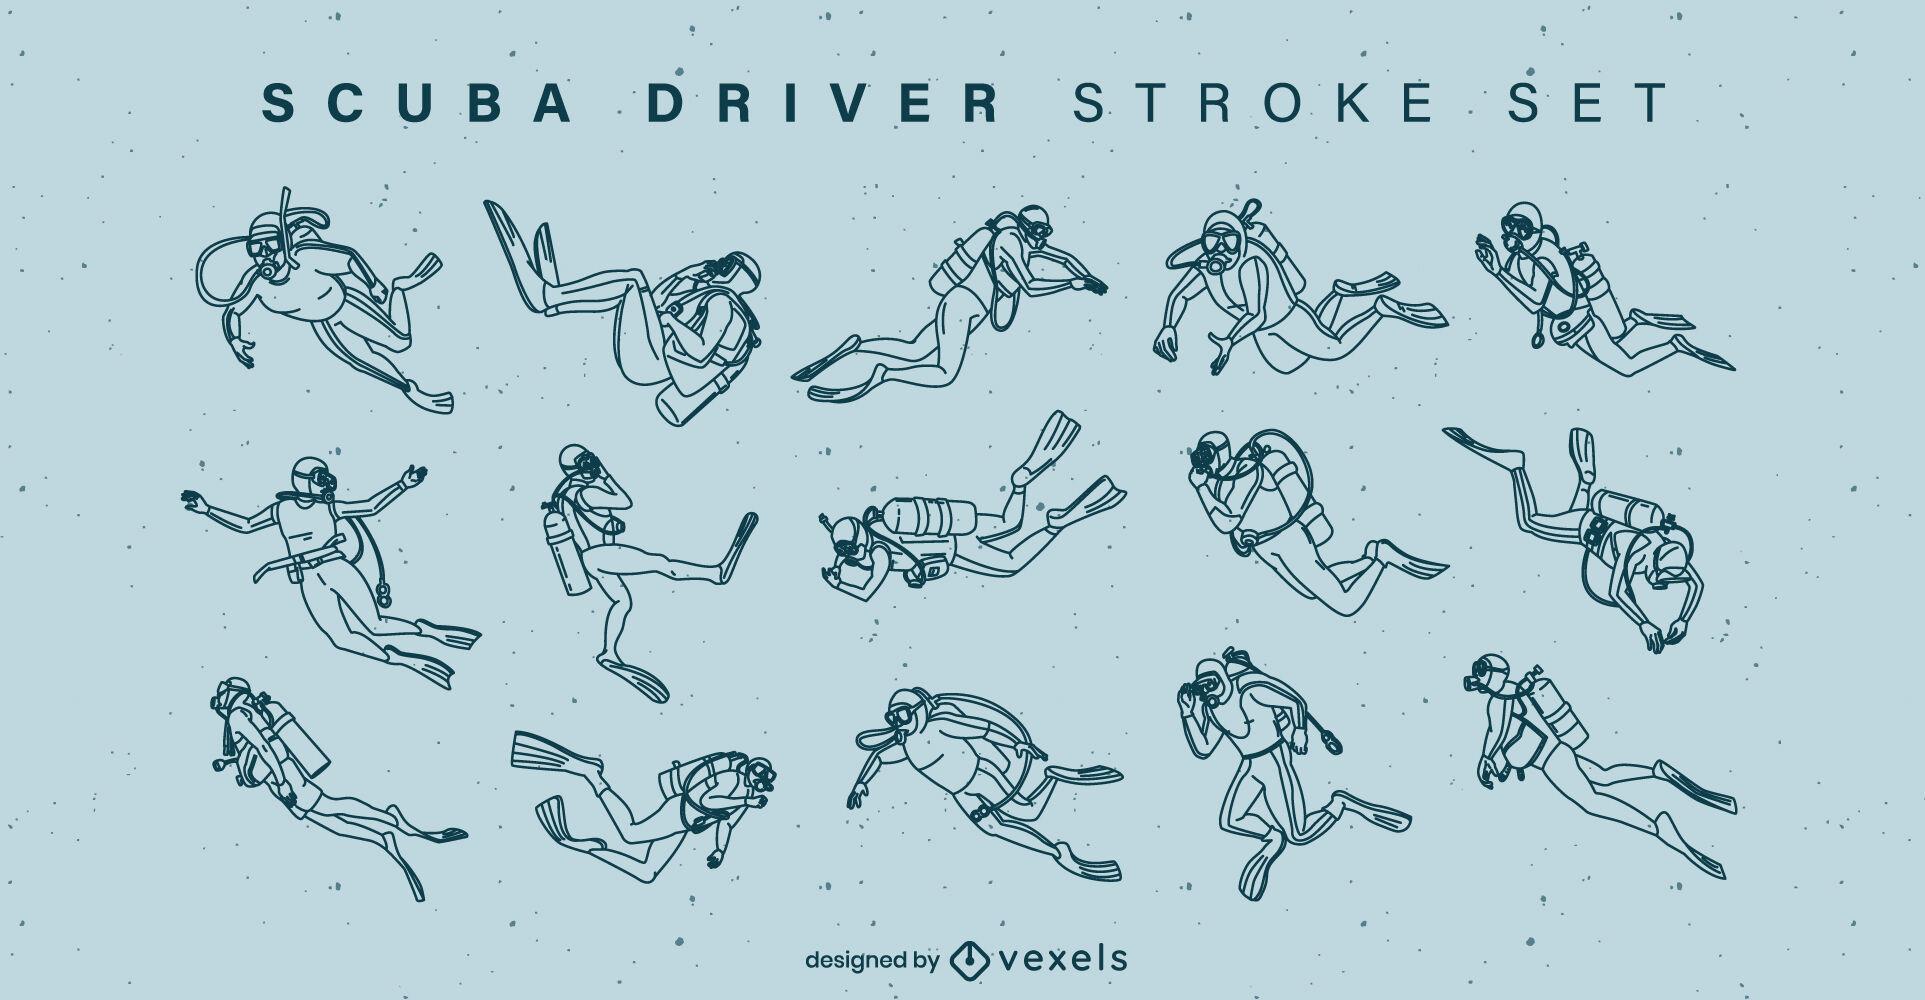 Scuba diving hobby people stroke set